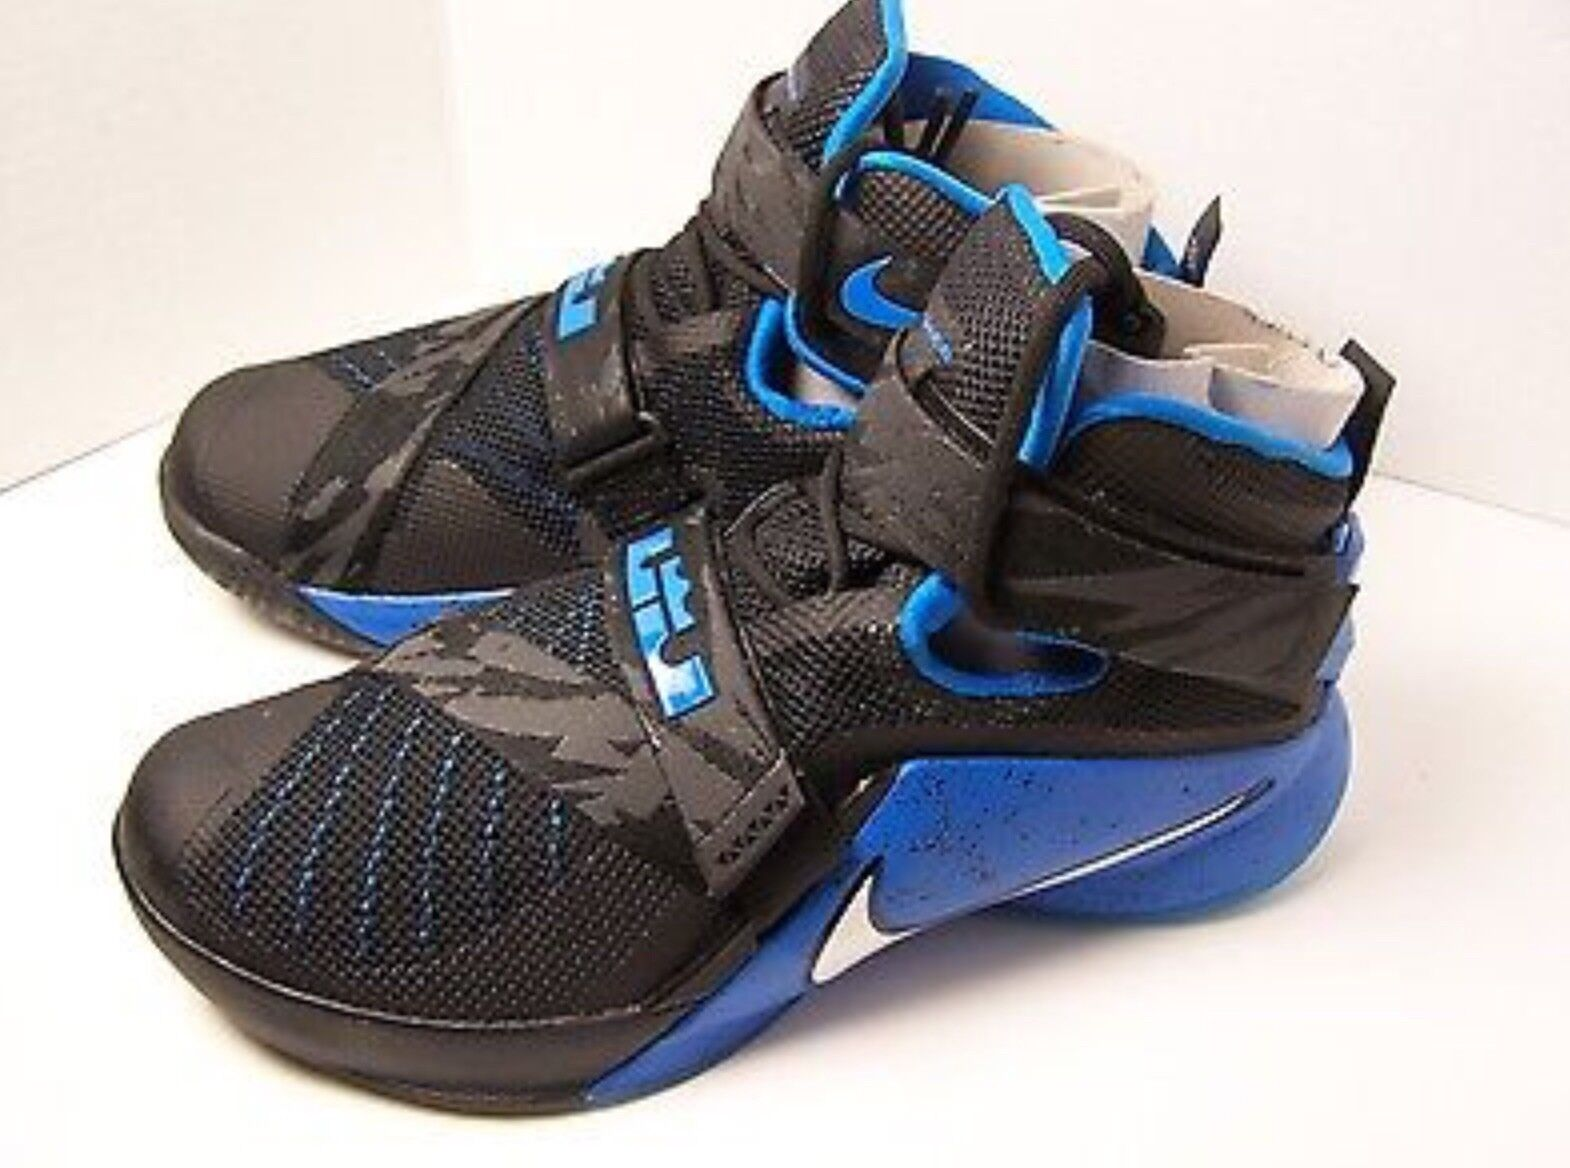 Nike Lebron Soldier 9 IX PRM Black bluee size 12 men's NEW